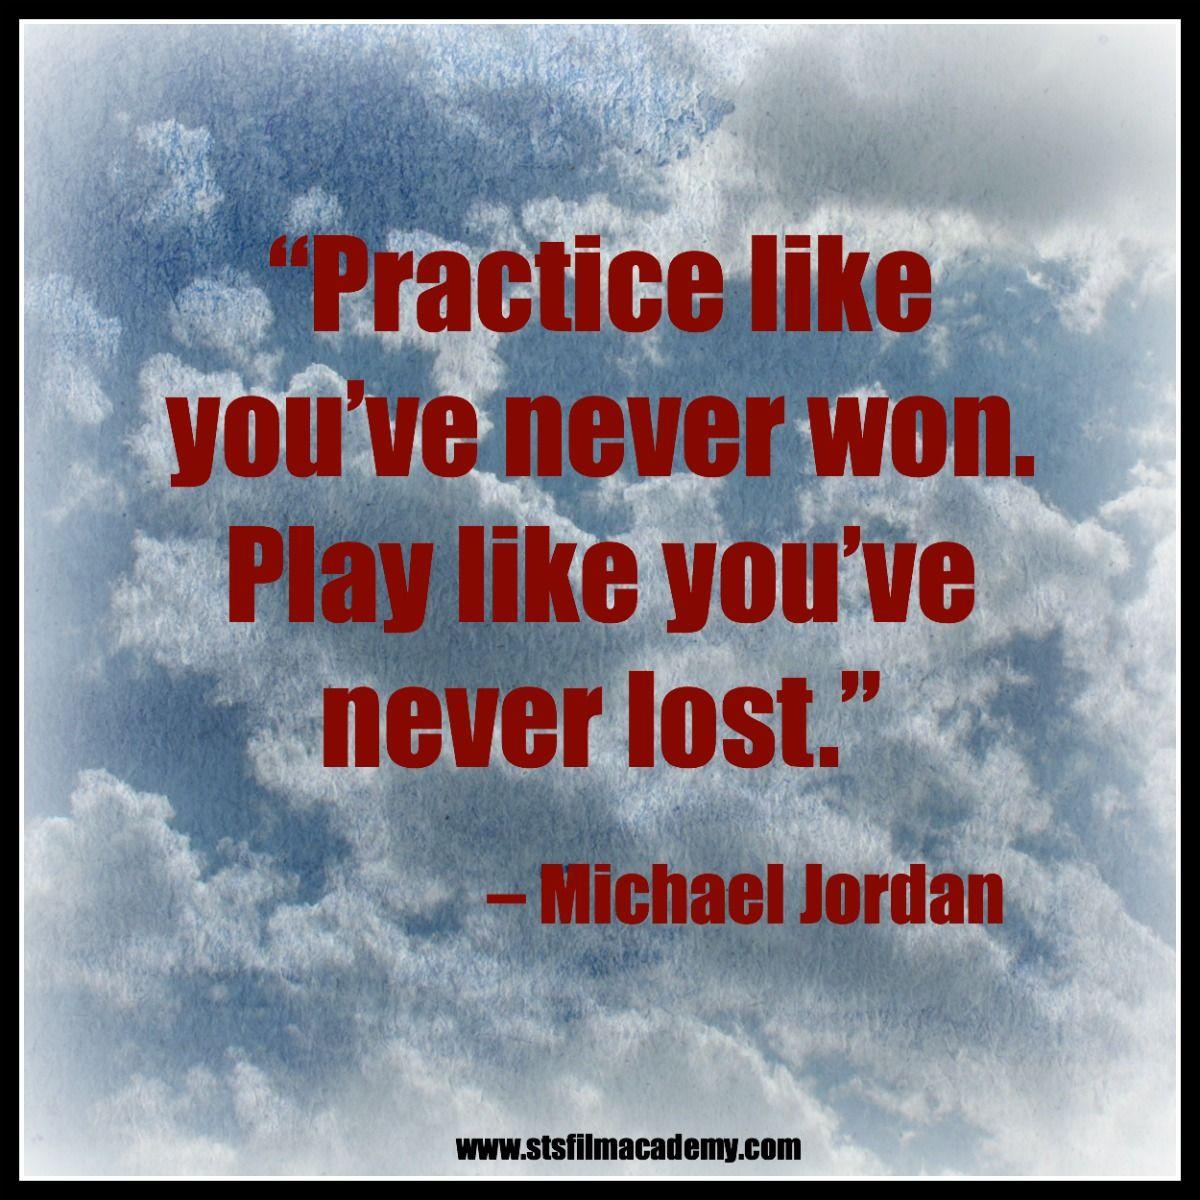 Quotes By Michael Jordan Michael Jordan Quote  Inspiration For Actors  Pinterest